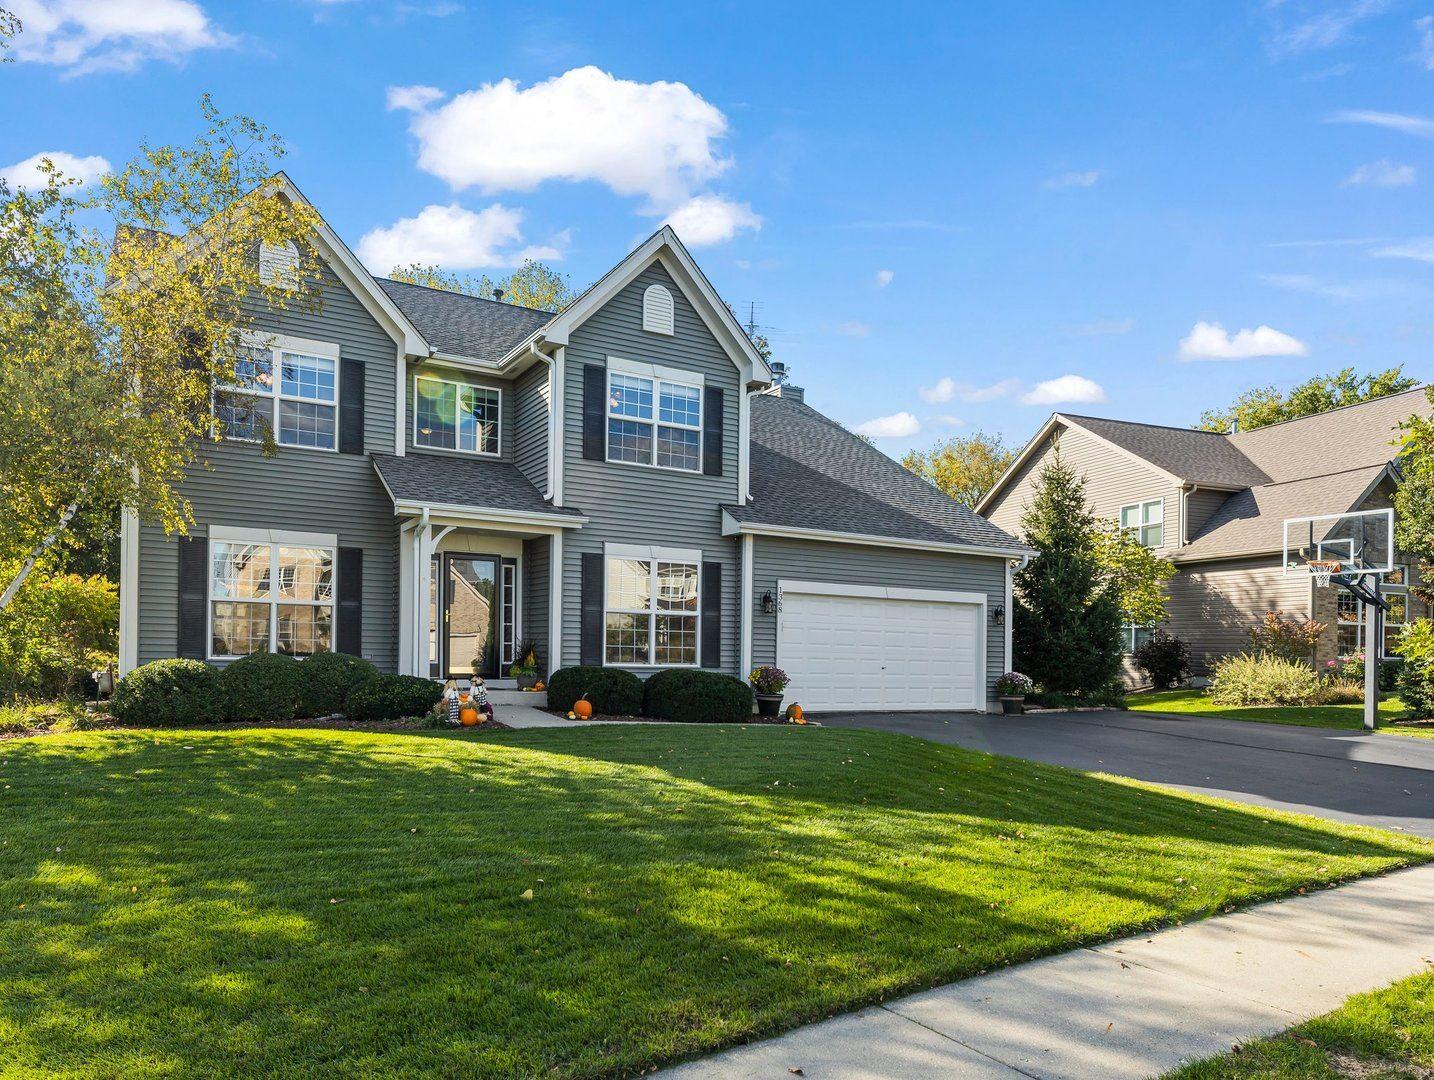 1368 Amberwood Drive, Crystal Lake, IL 60014 - #: 11249775